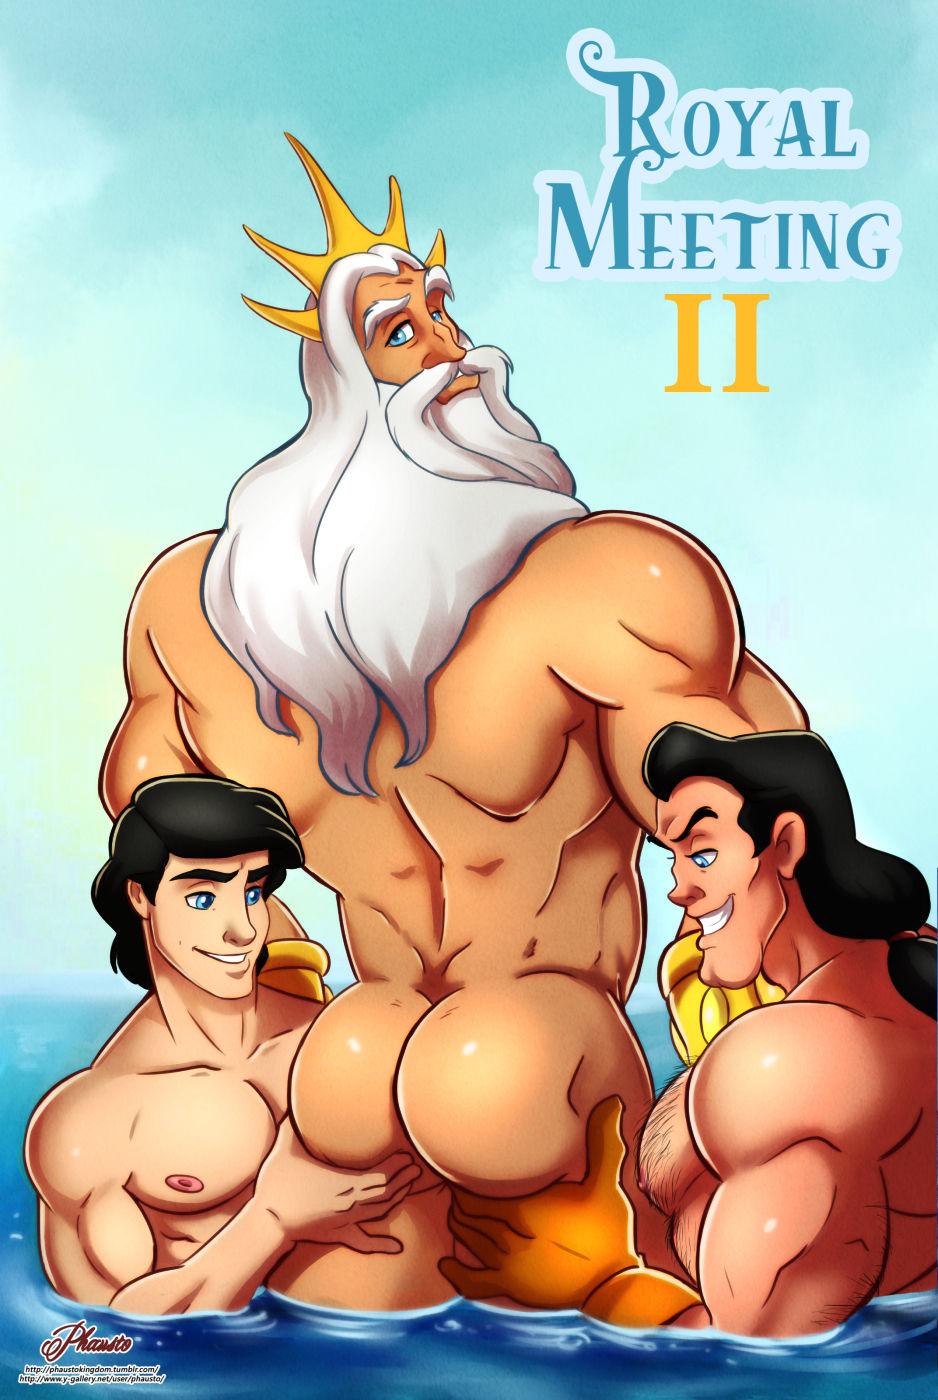 Porno free disney Disney porn: